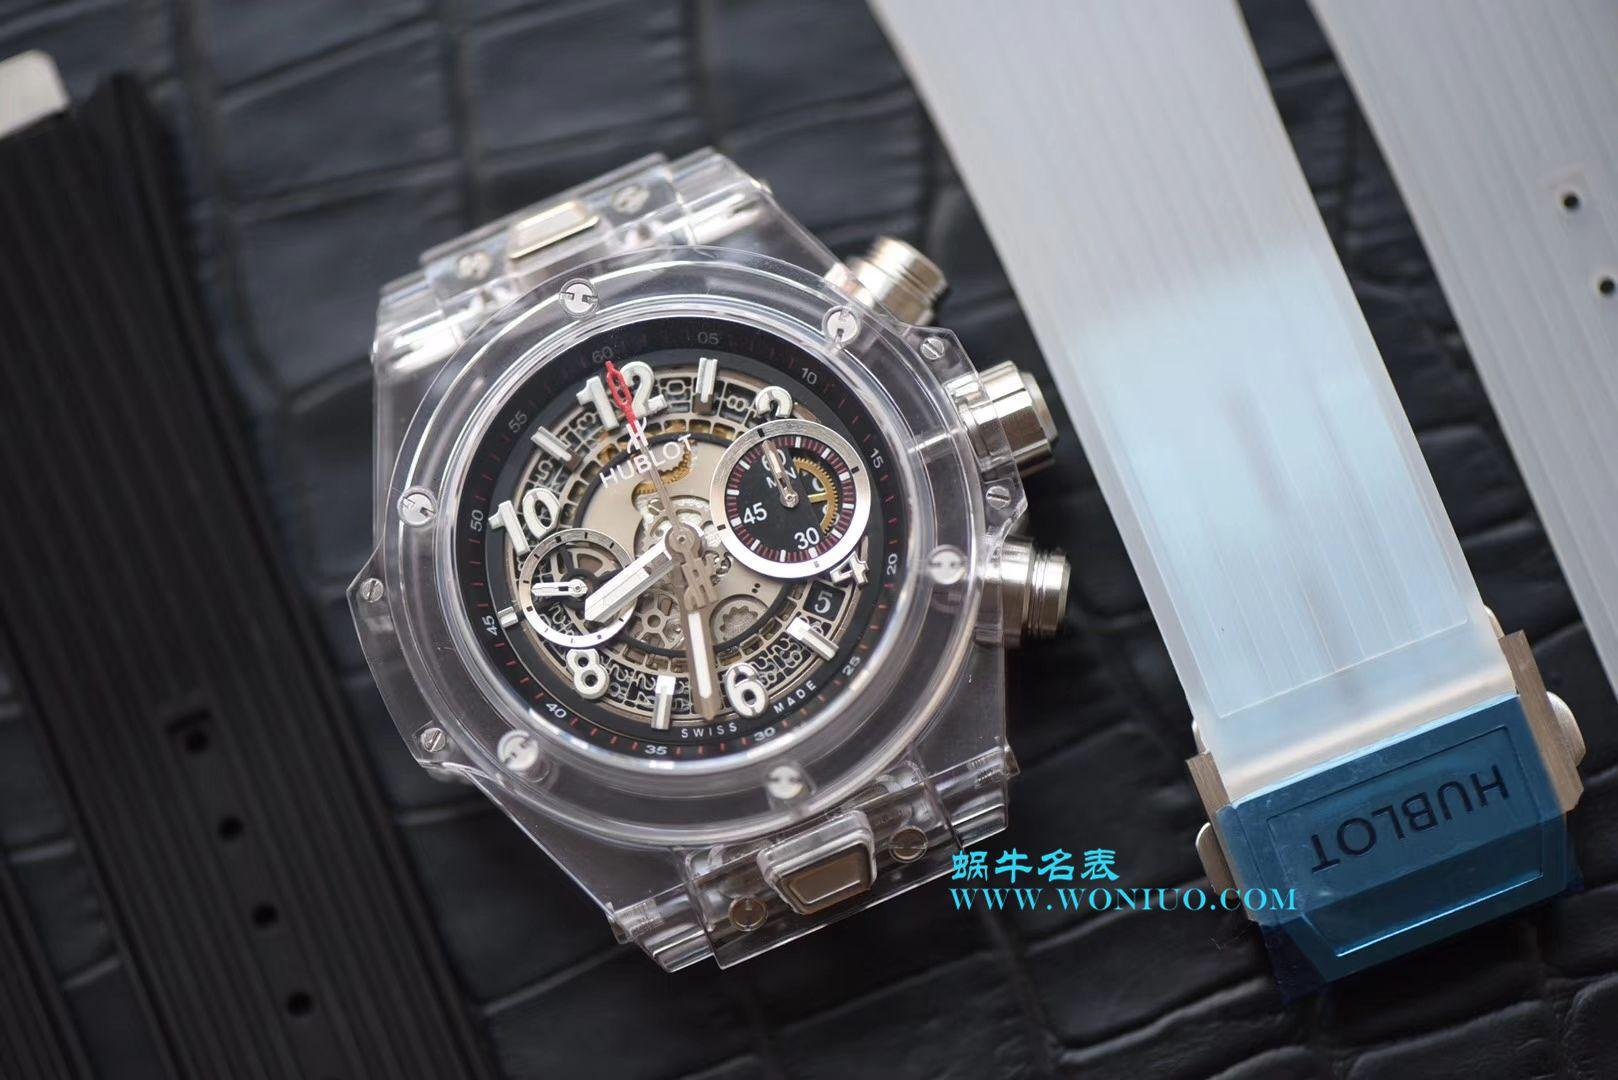 【JB一比一超A高仿手表】宇舶BIG BANG系列411.JX.4802.RT腕表 / YB057